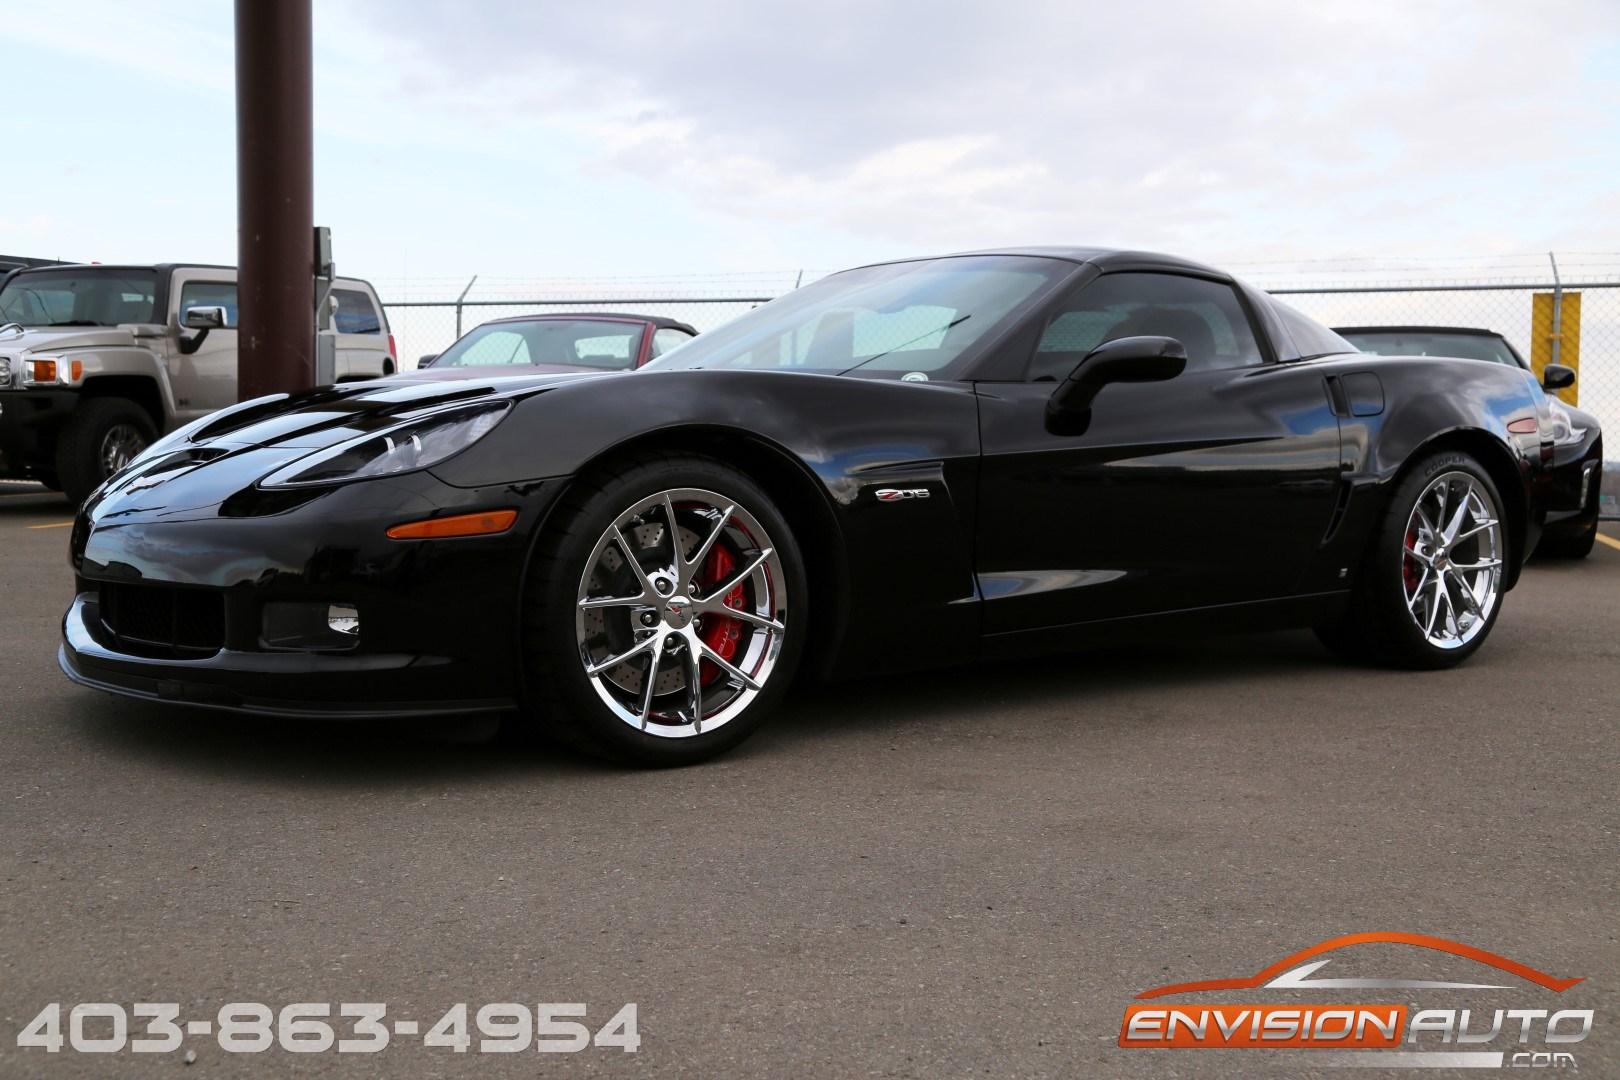 2009 Chevrolet Corvette Z06 3lz 505hp Only 21 800 Kms